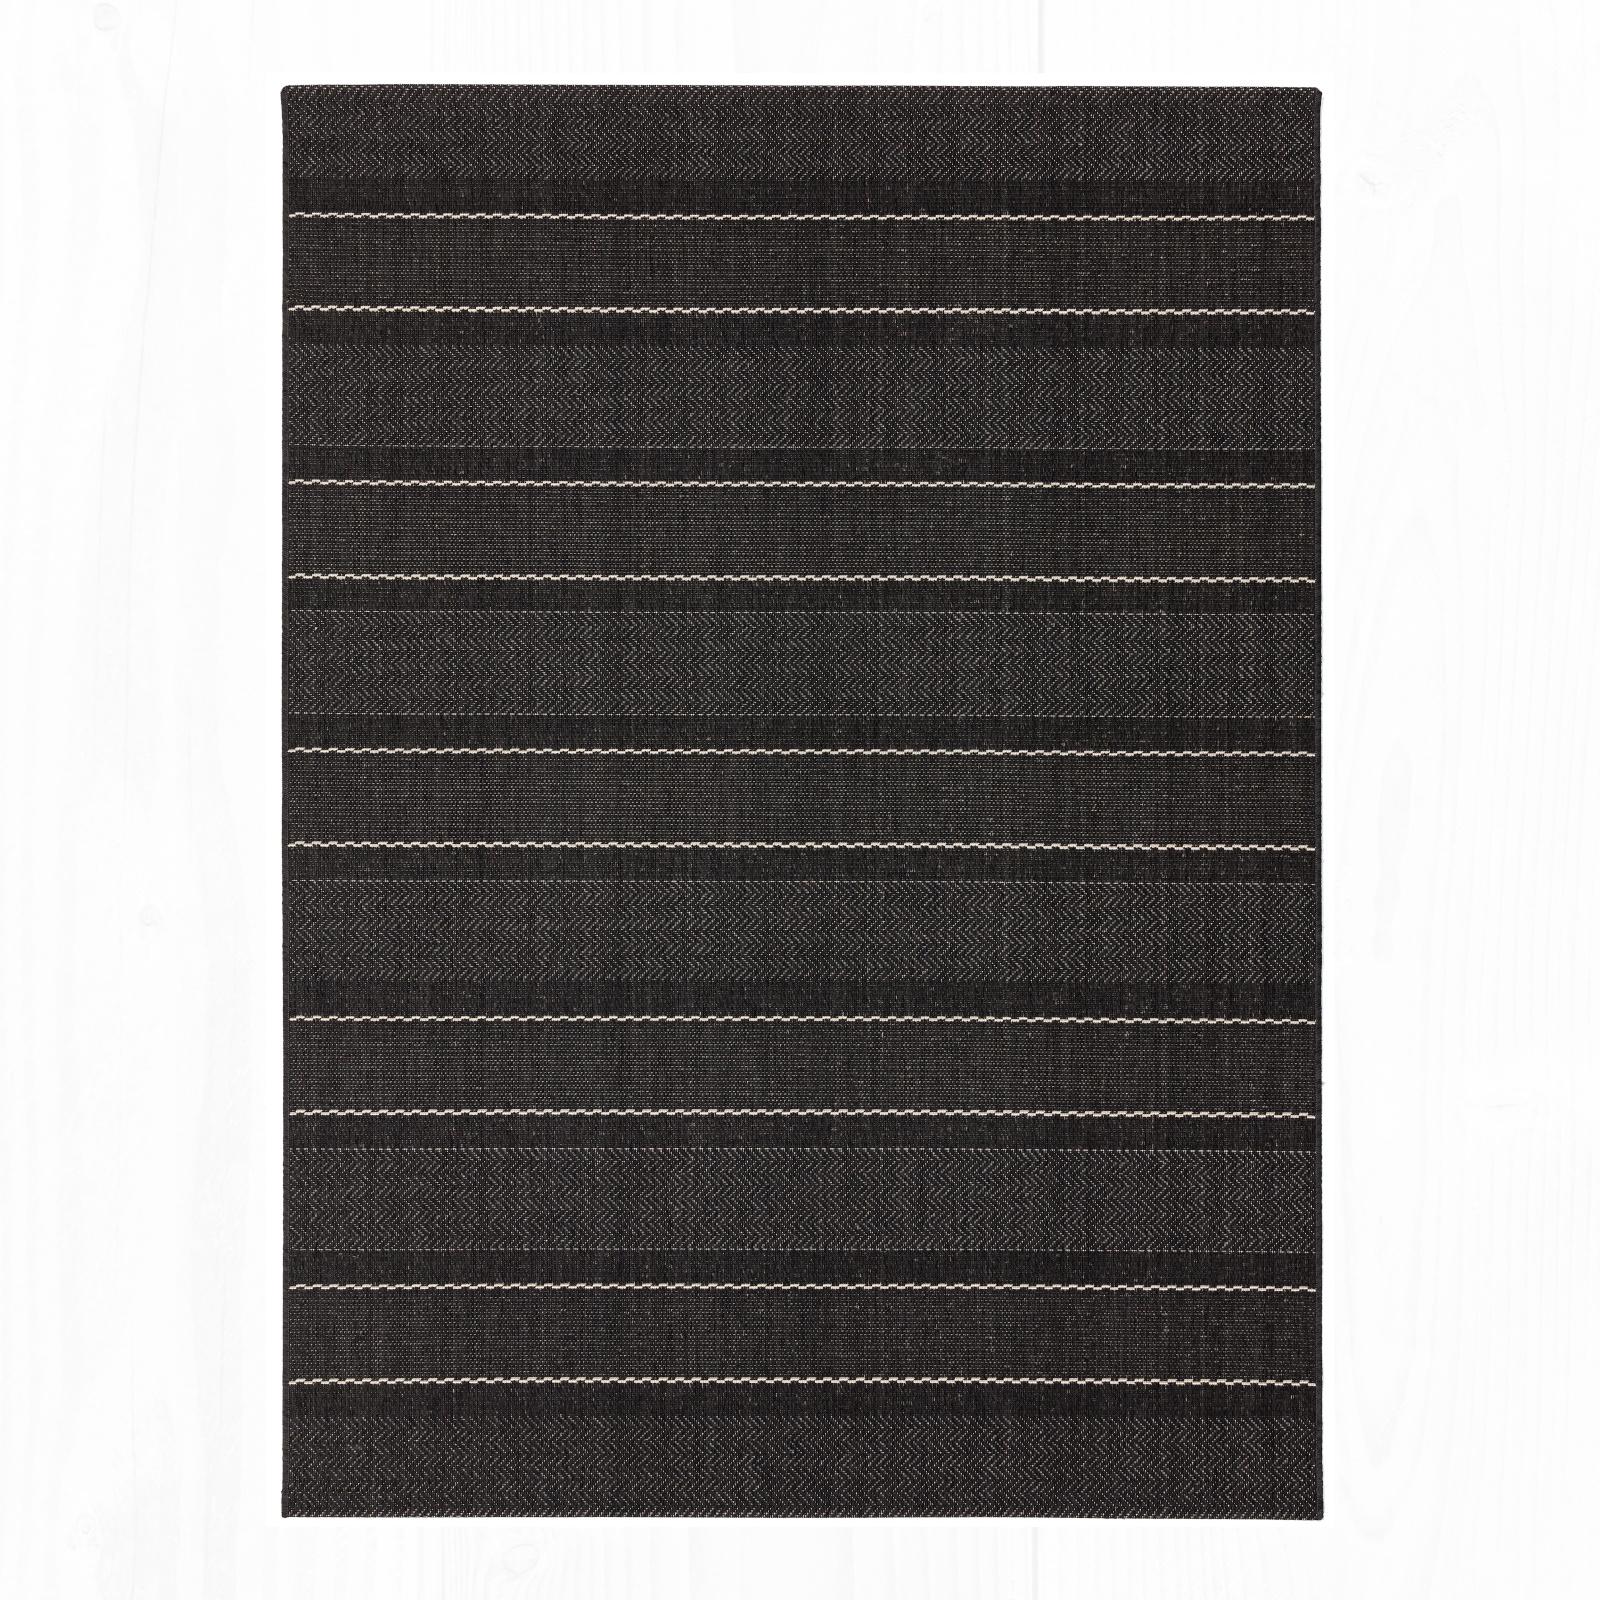 Patio - 05 Charcoal Stripe